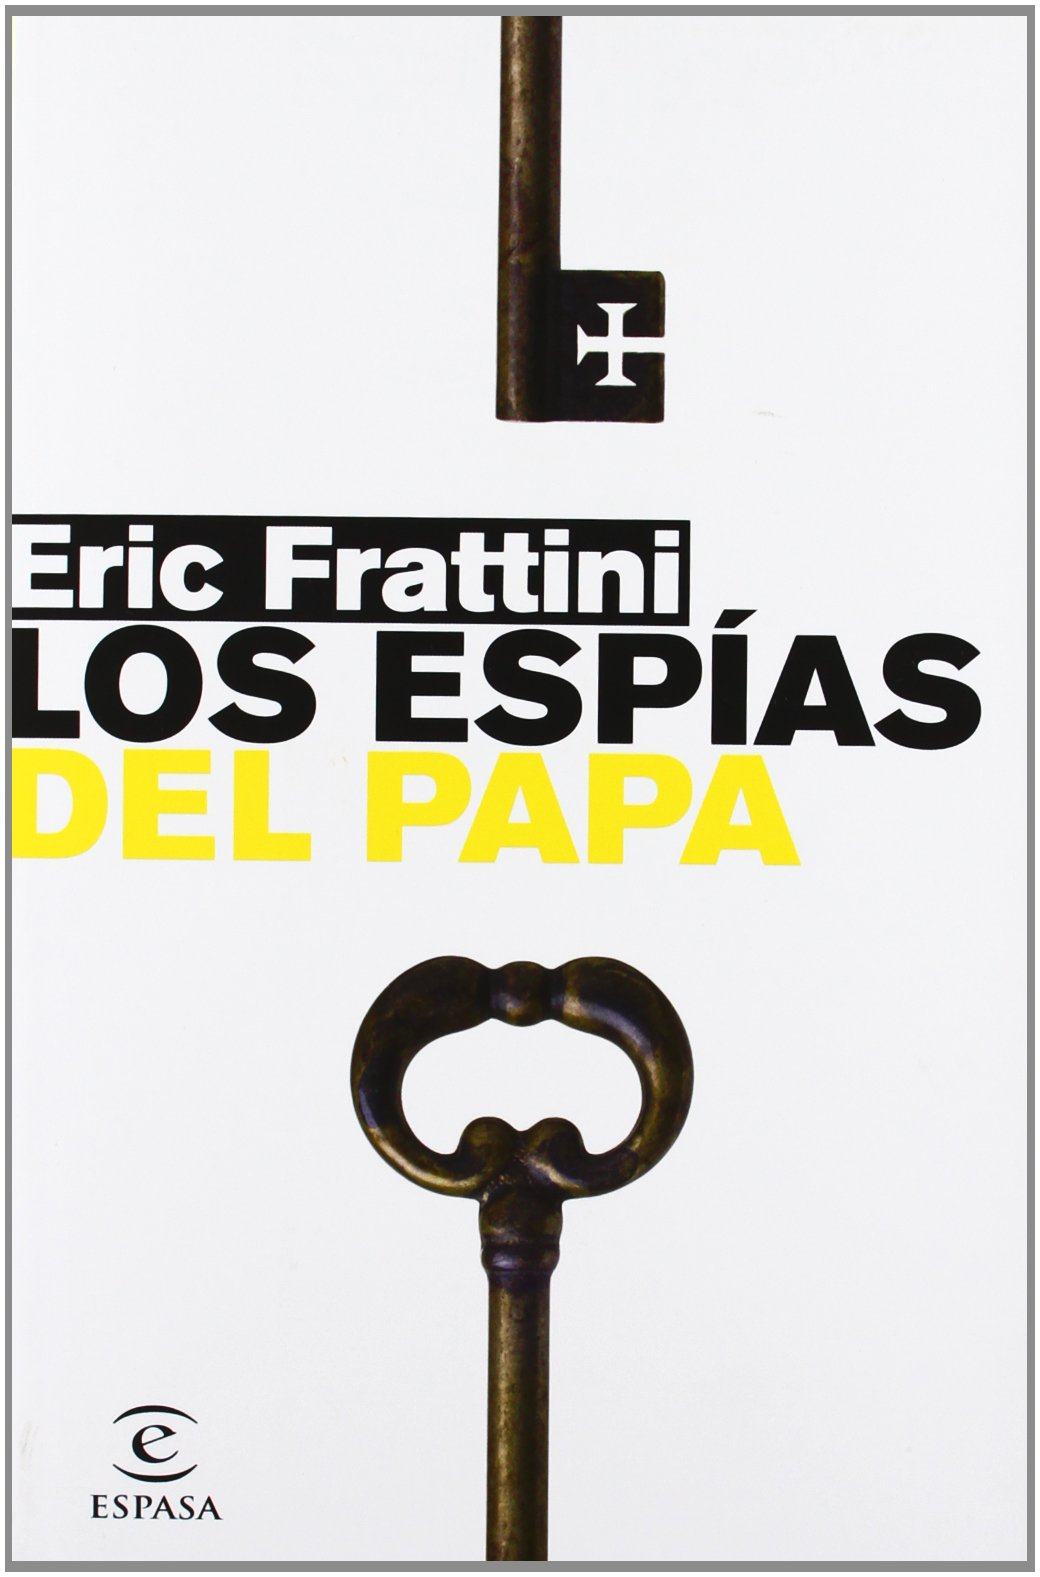 Los espías del papa (ESPASA HOY) Tapa blanda – 15 ene 2008 Eric Frattini 846702707X Christian - Historical Spanish: Adult Fiction